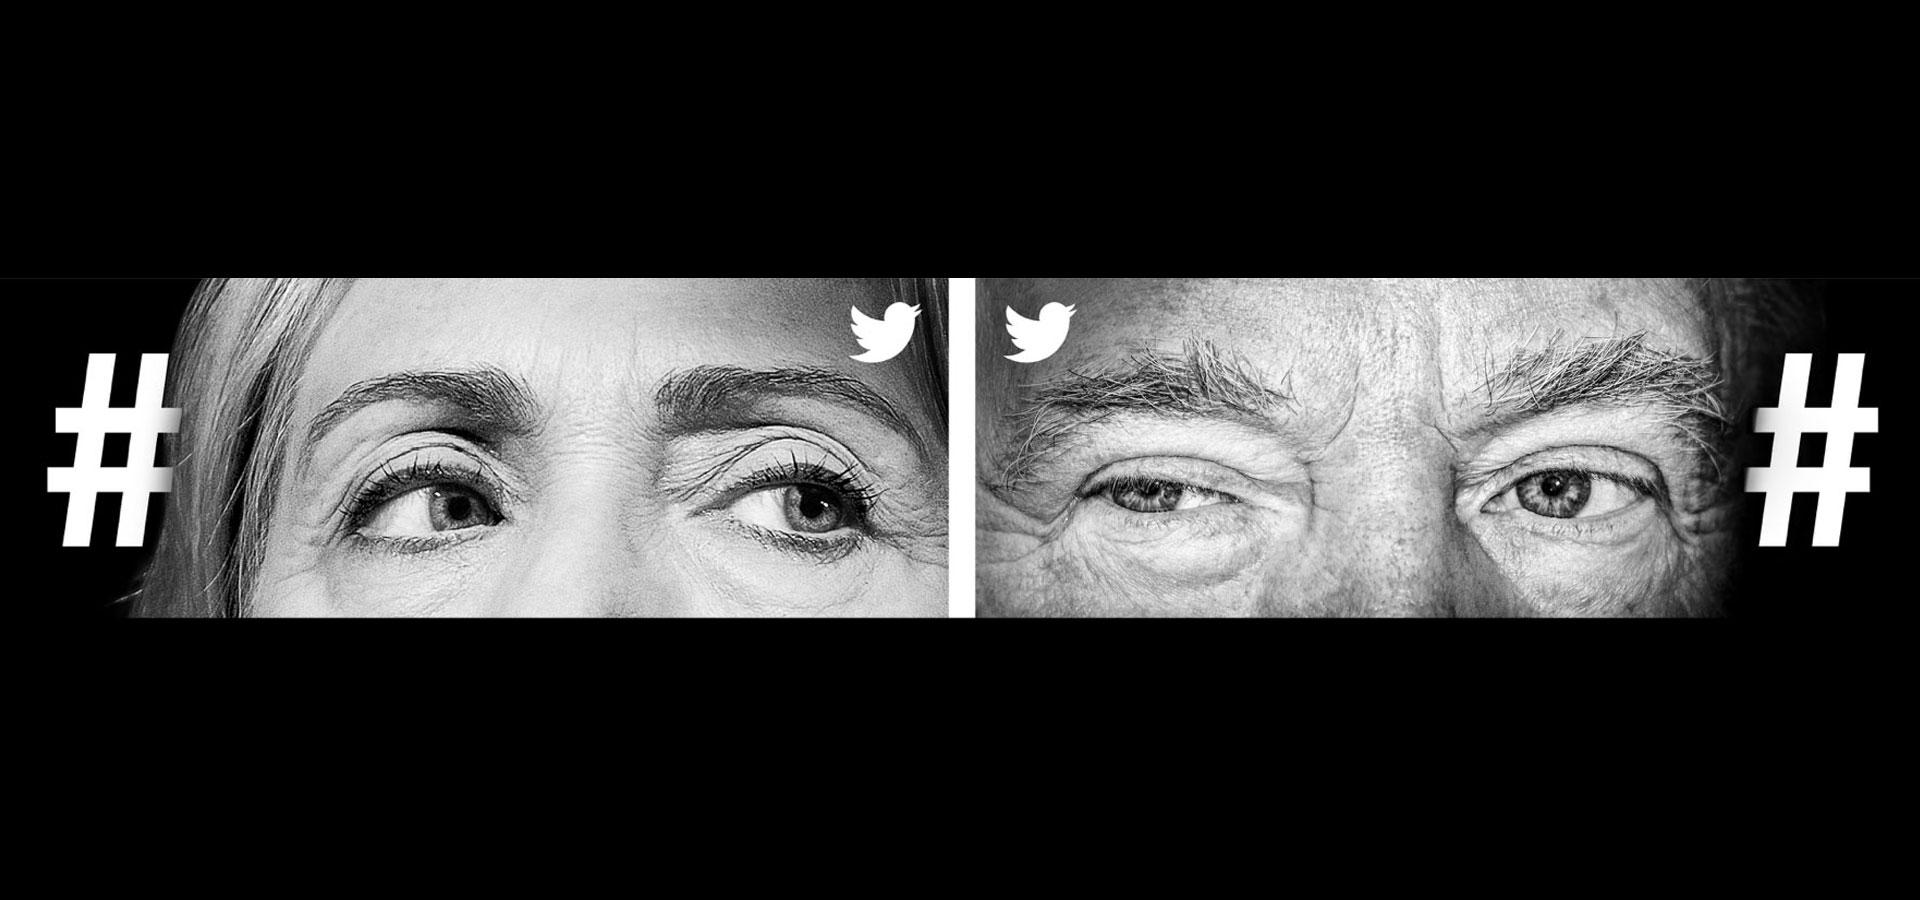 Hashtag Trump Clinton